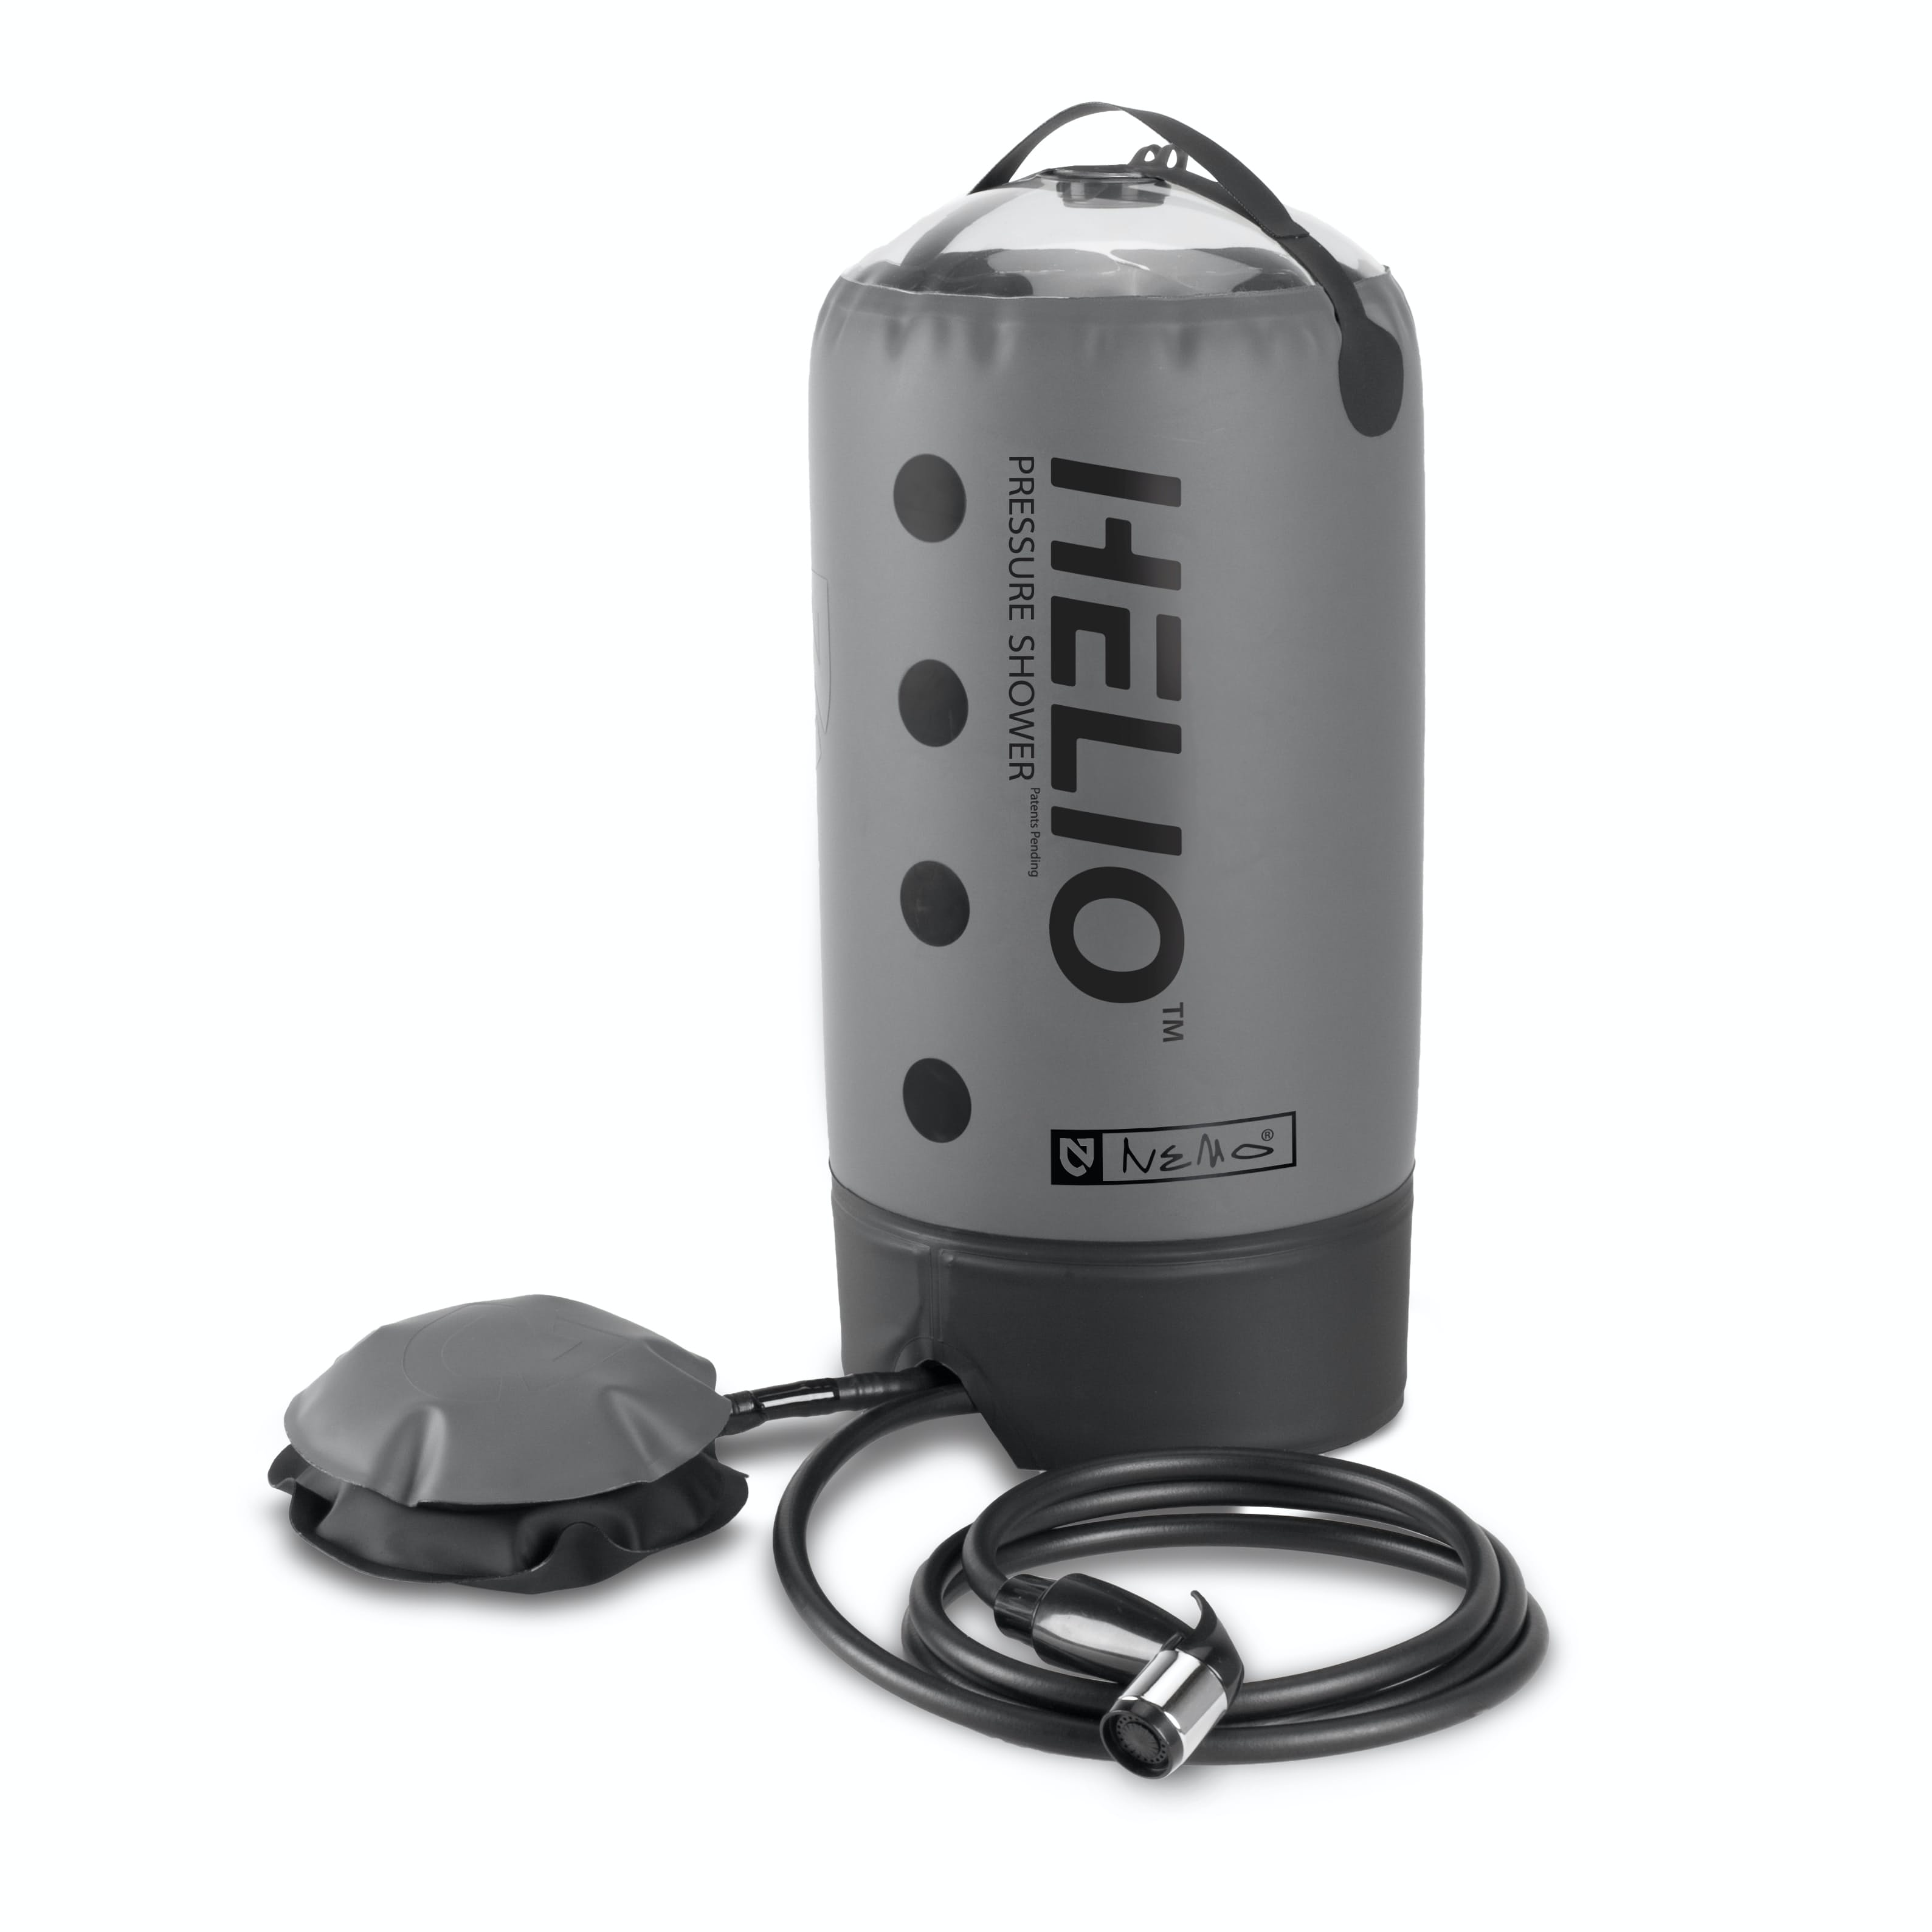 Ryfuvvsqh7 nemo equipment helio pressure shower 0 original